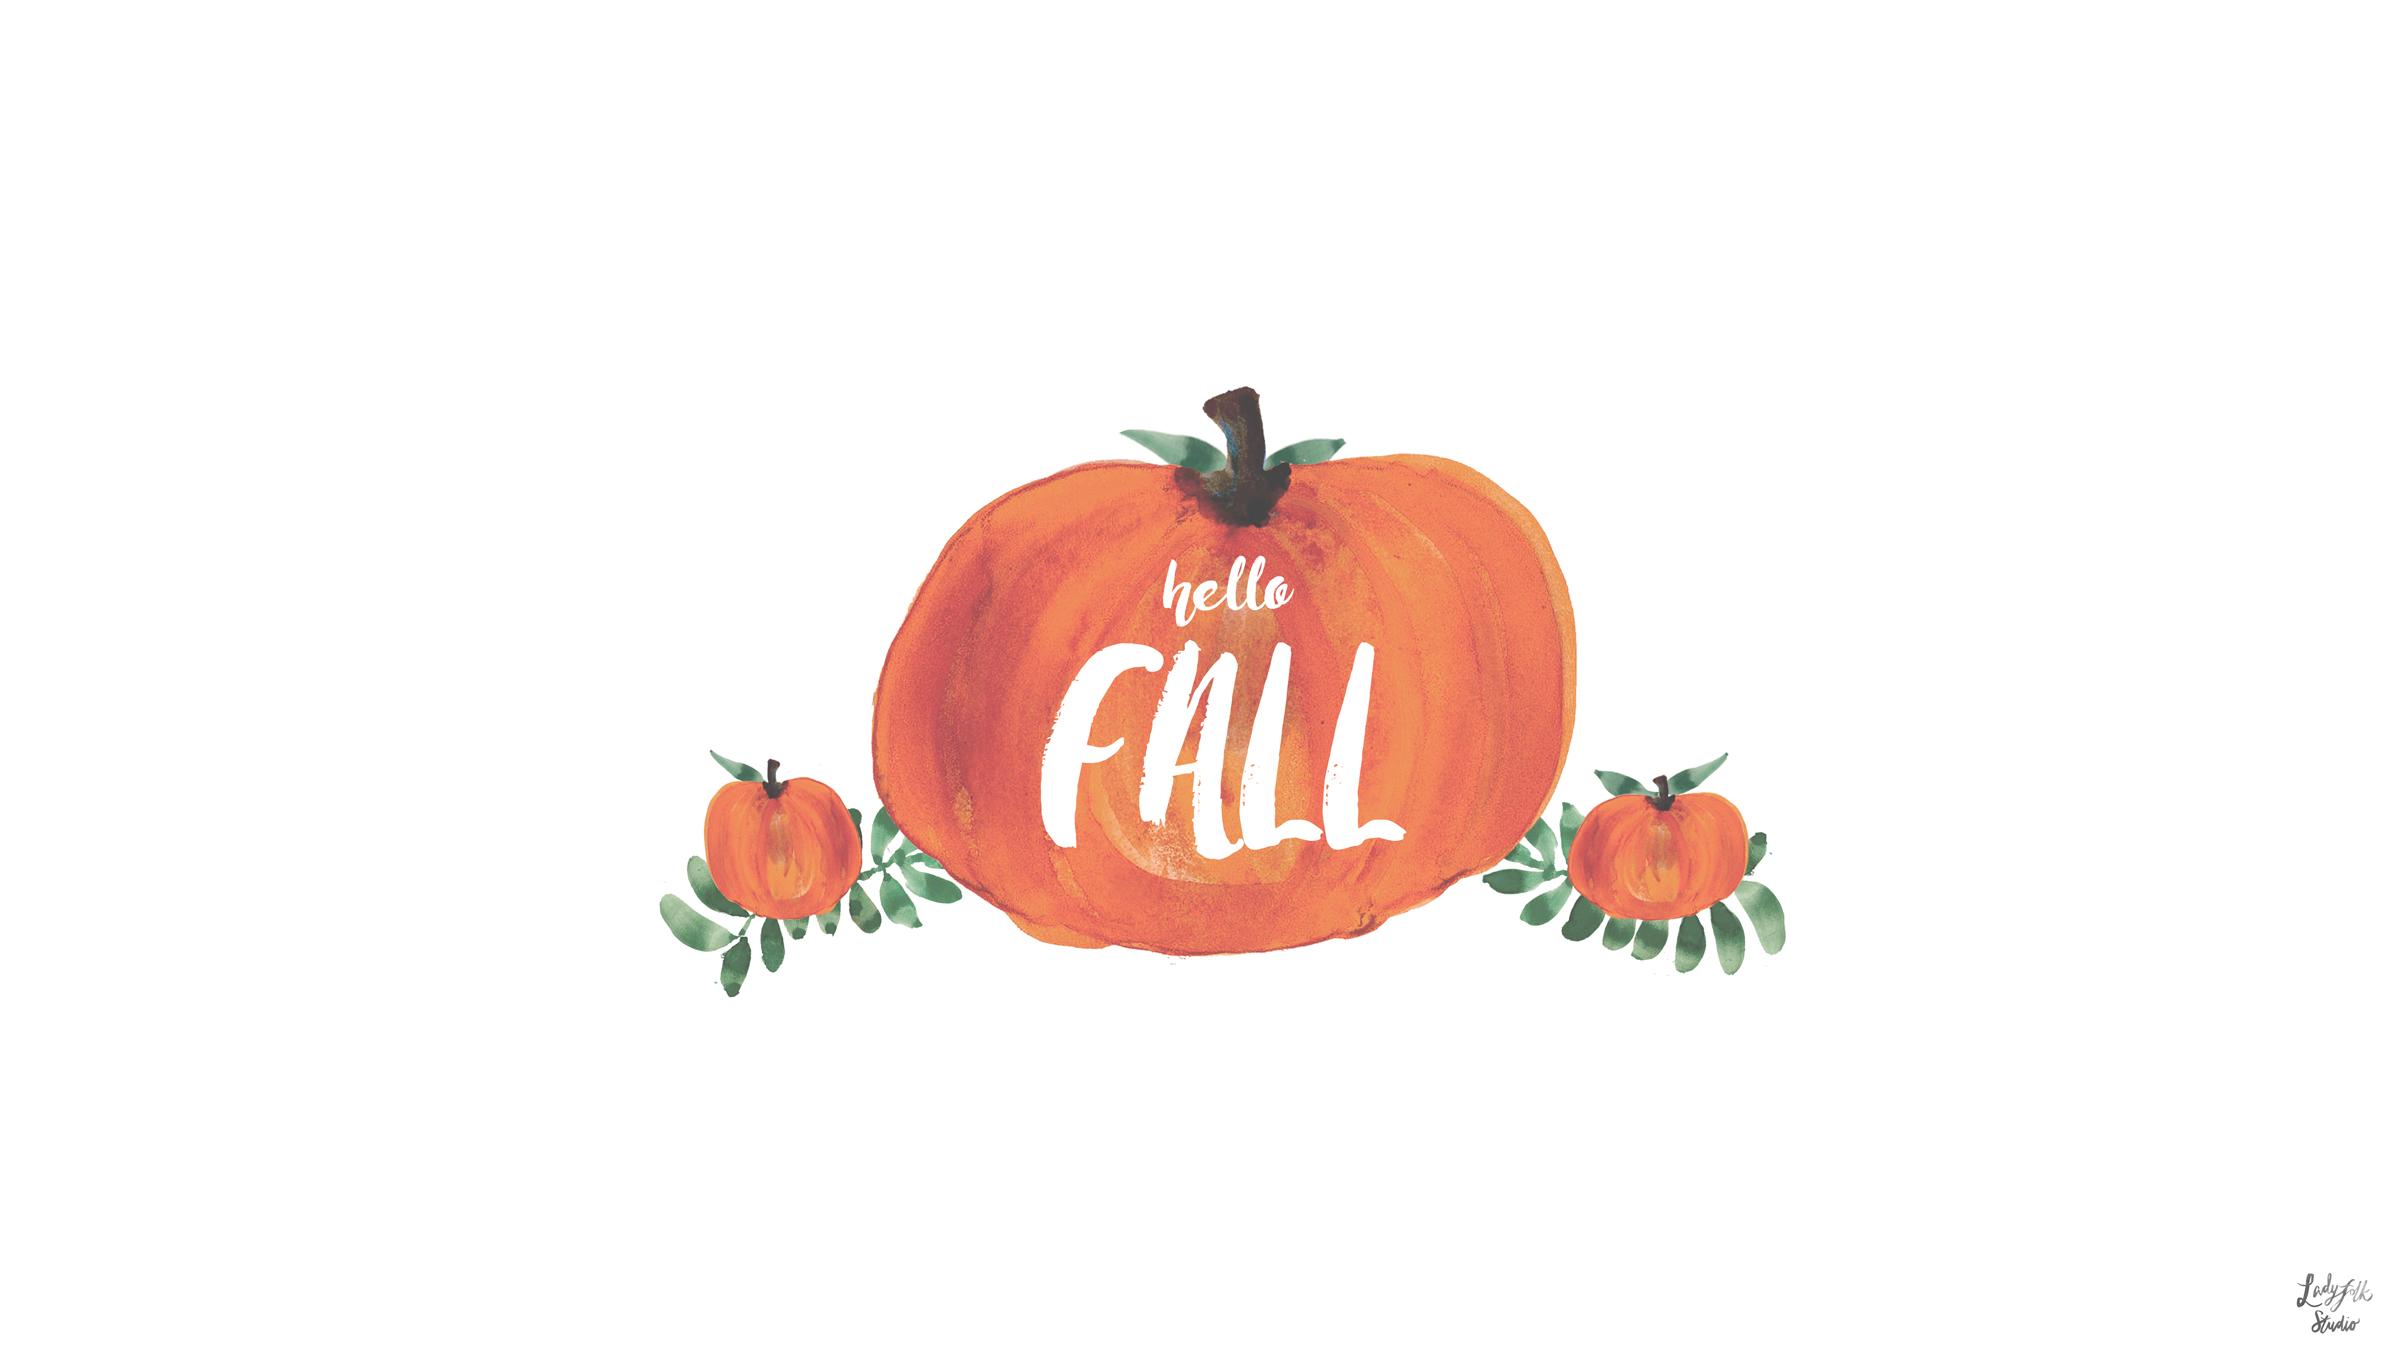 Hello Fall: New pumpkin watercolor desktop art to inspire you from Ladyfolk Studio!